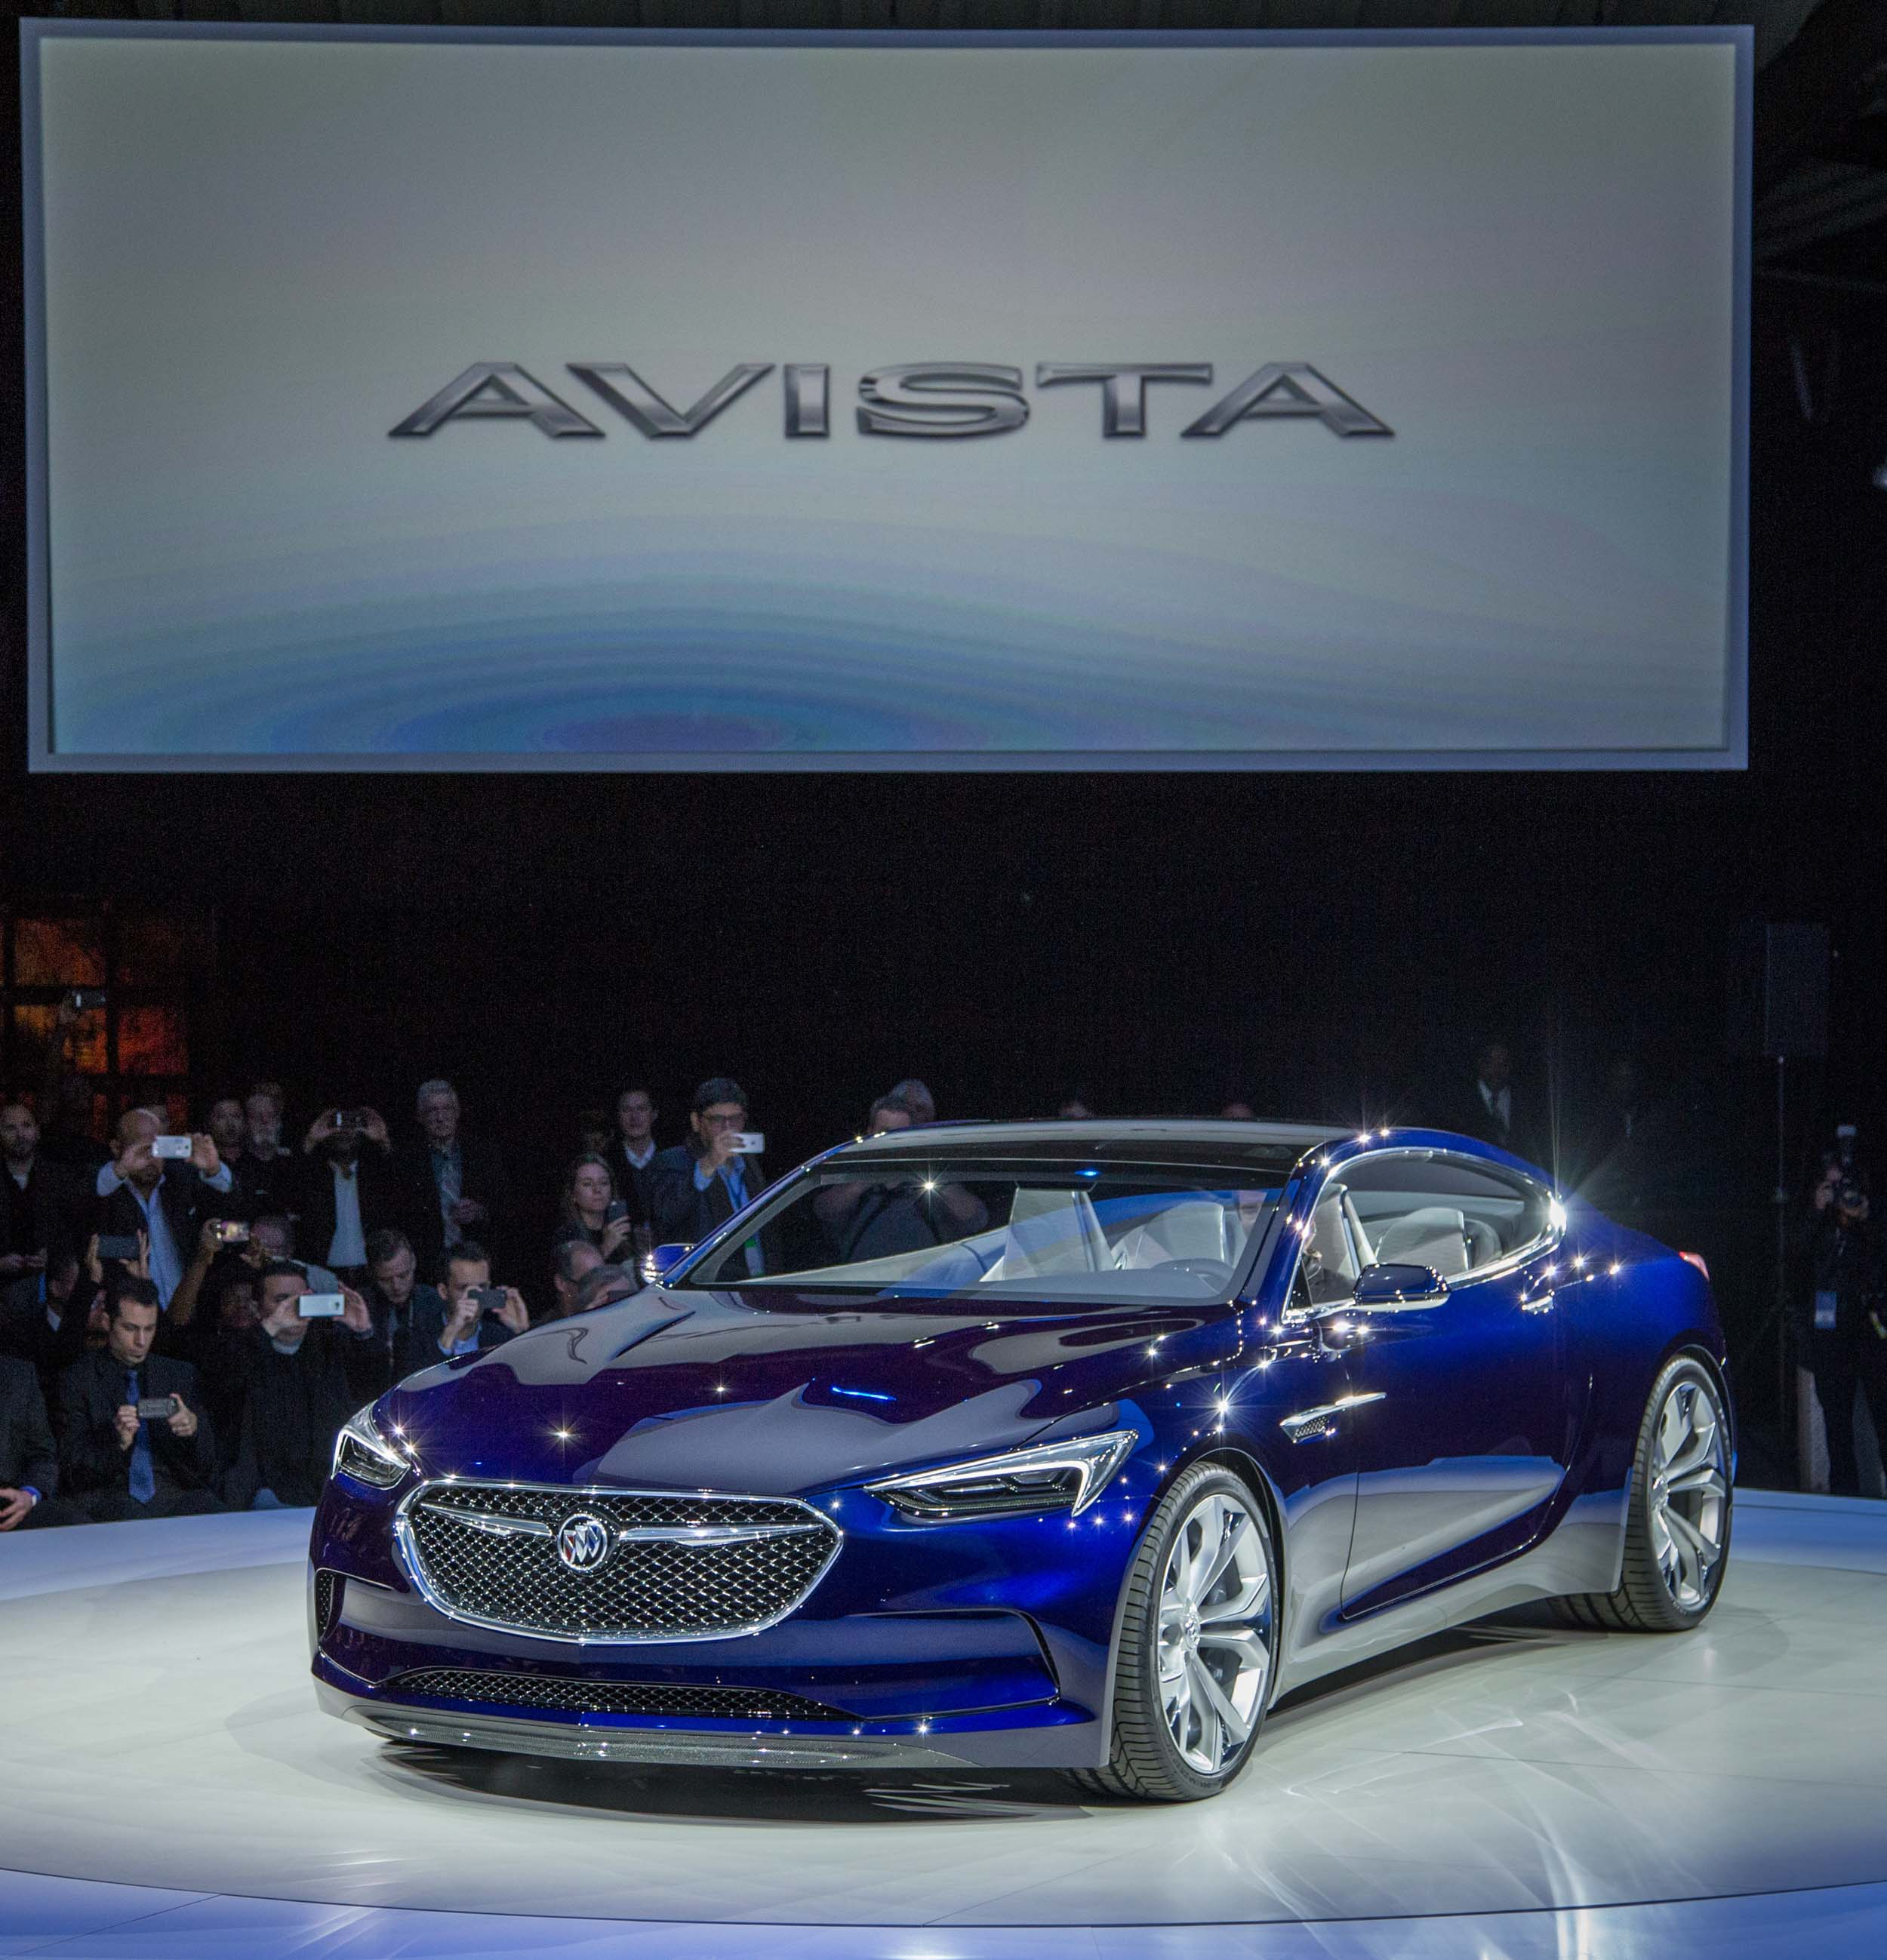 Buick Avista Concept Live Photos: 2016 NAIAS • Carfanatics